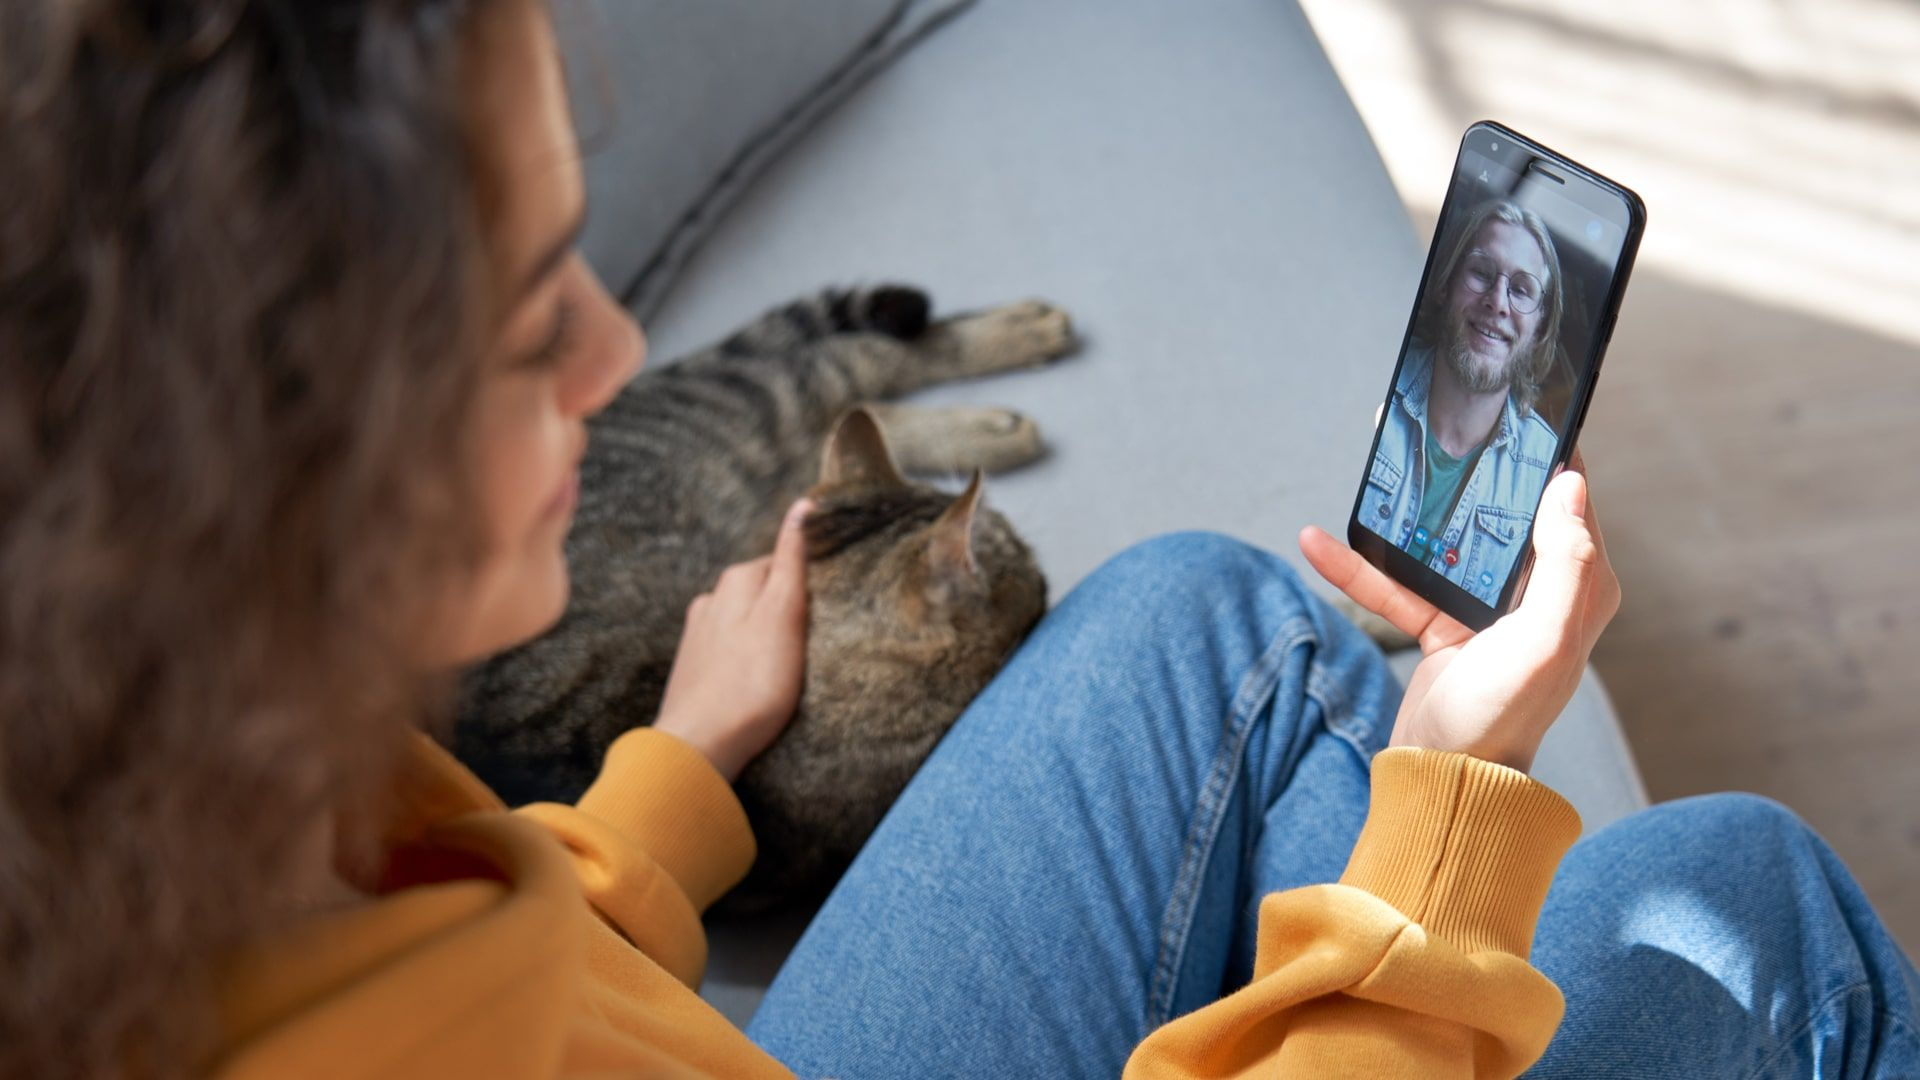 App Zoom para videoconferências se tornou popular durante quarentena (Foto: Shutterstock)